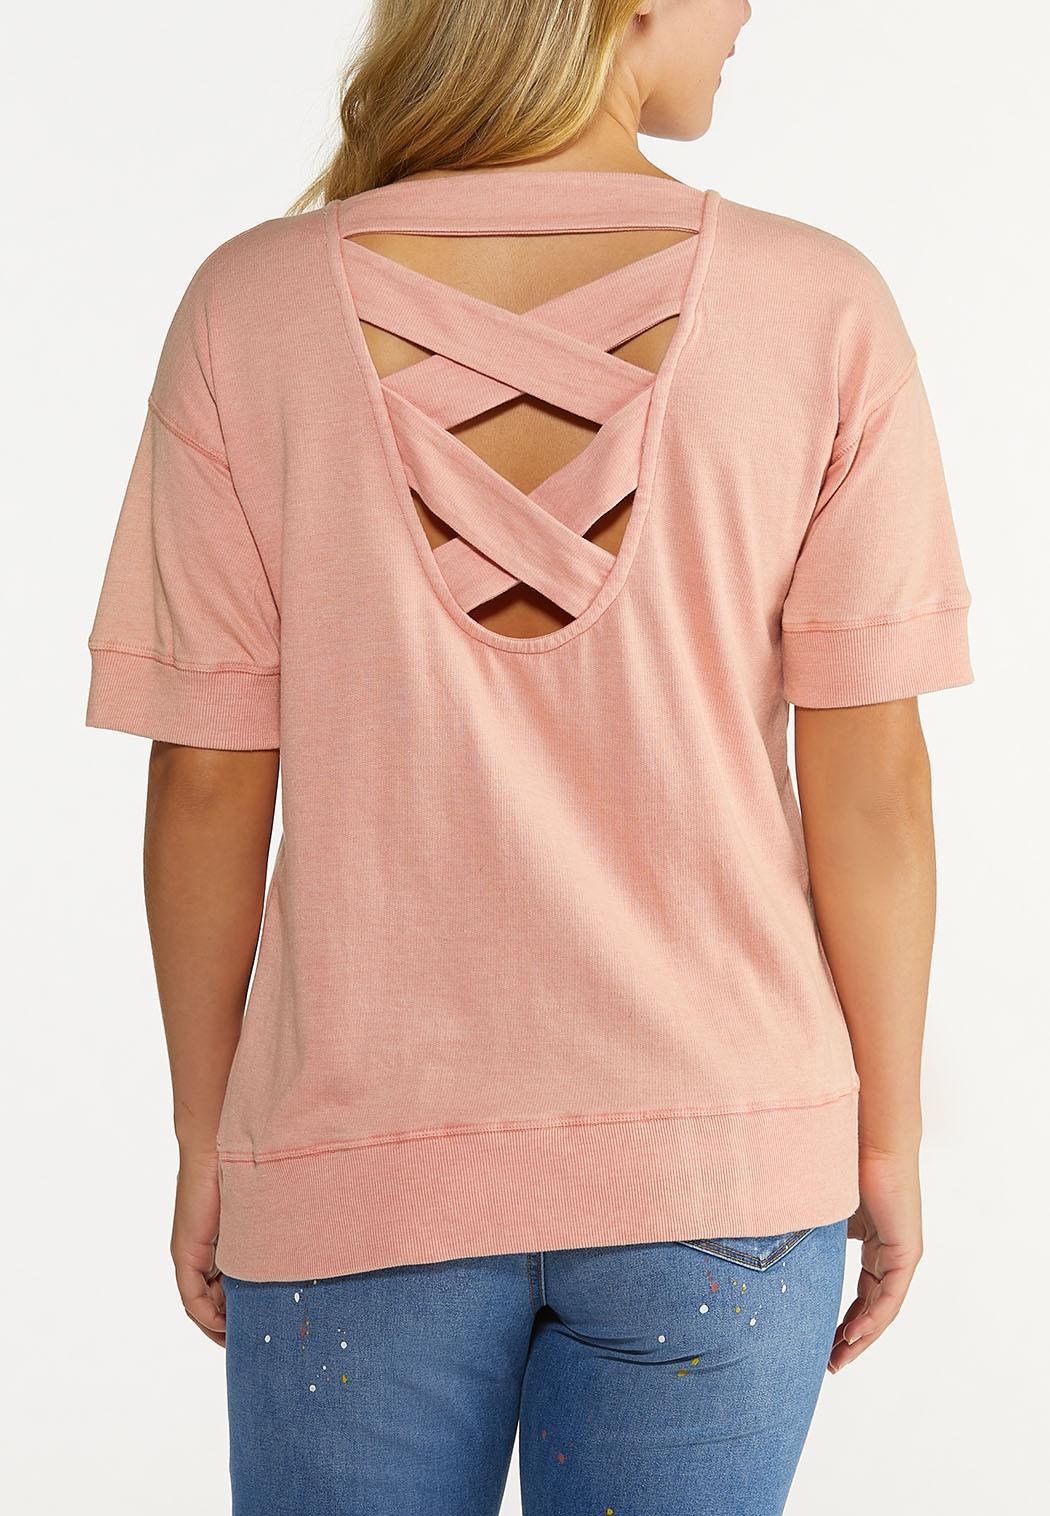 Criss Cross Back Sweatshirt (Item #44623774)